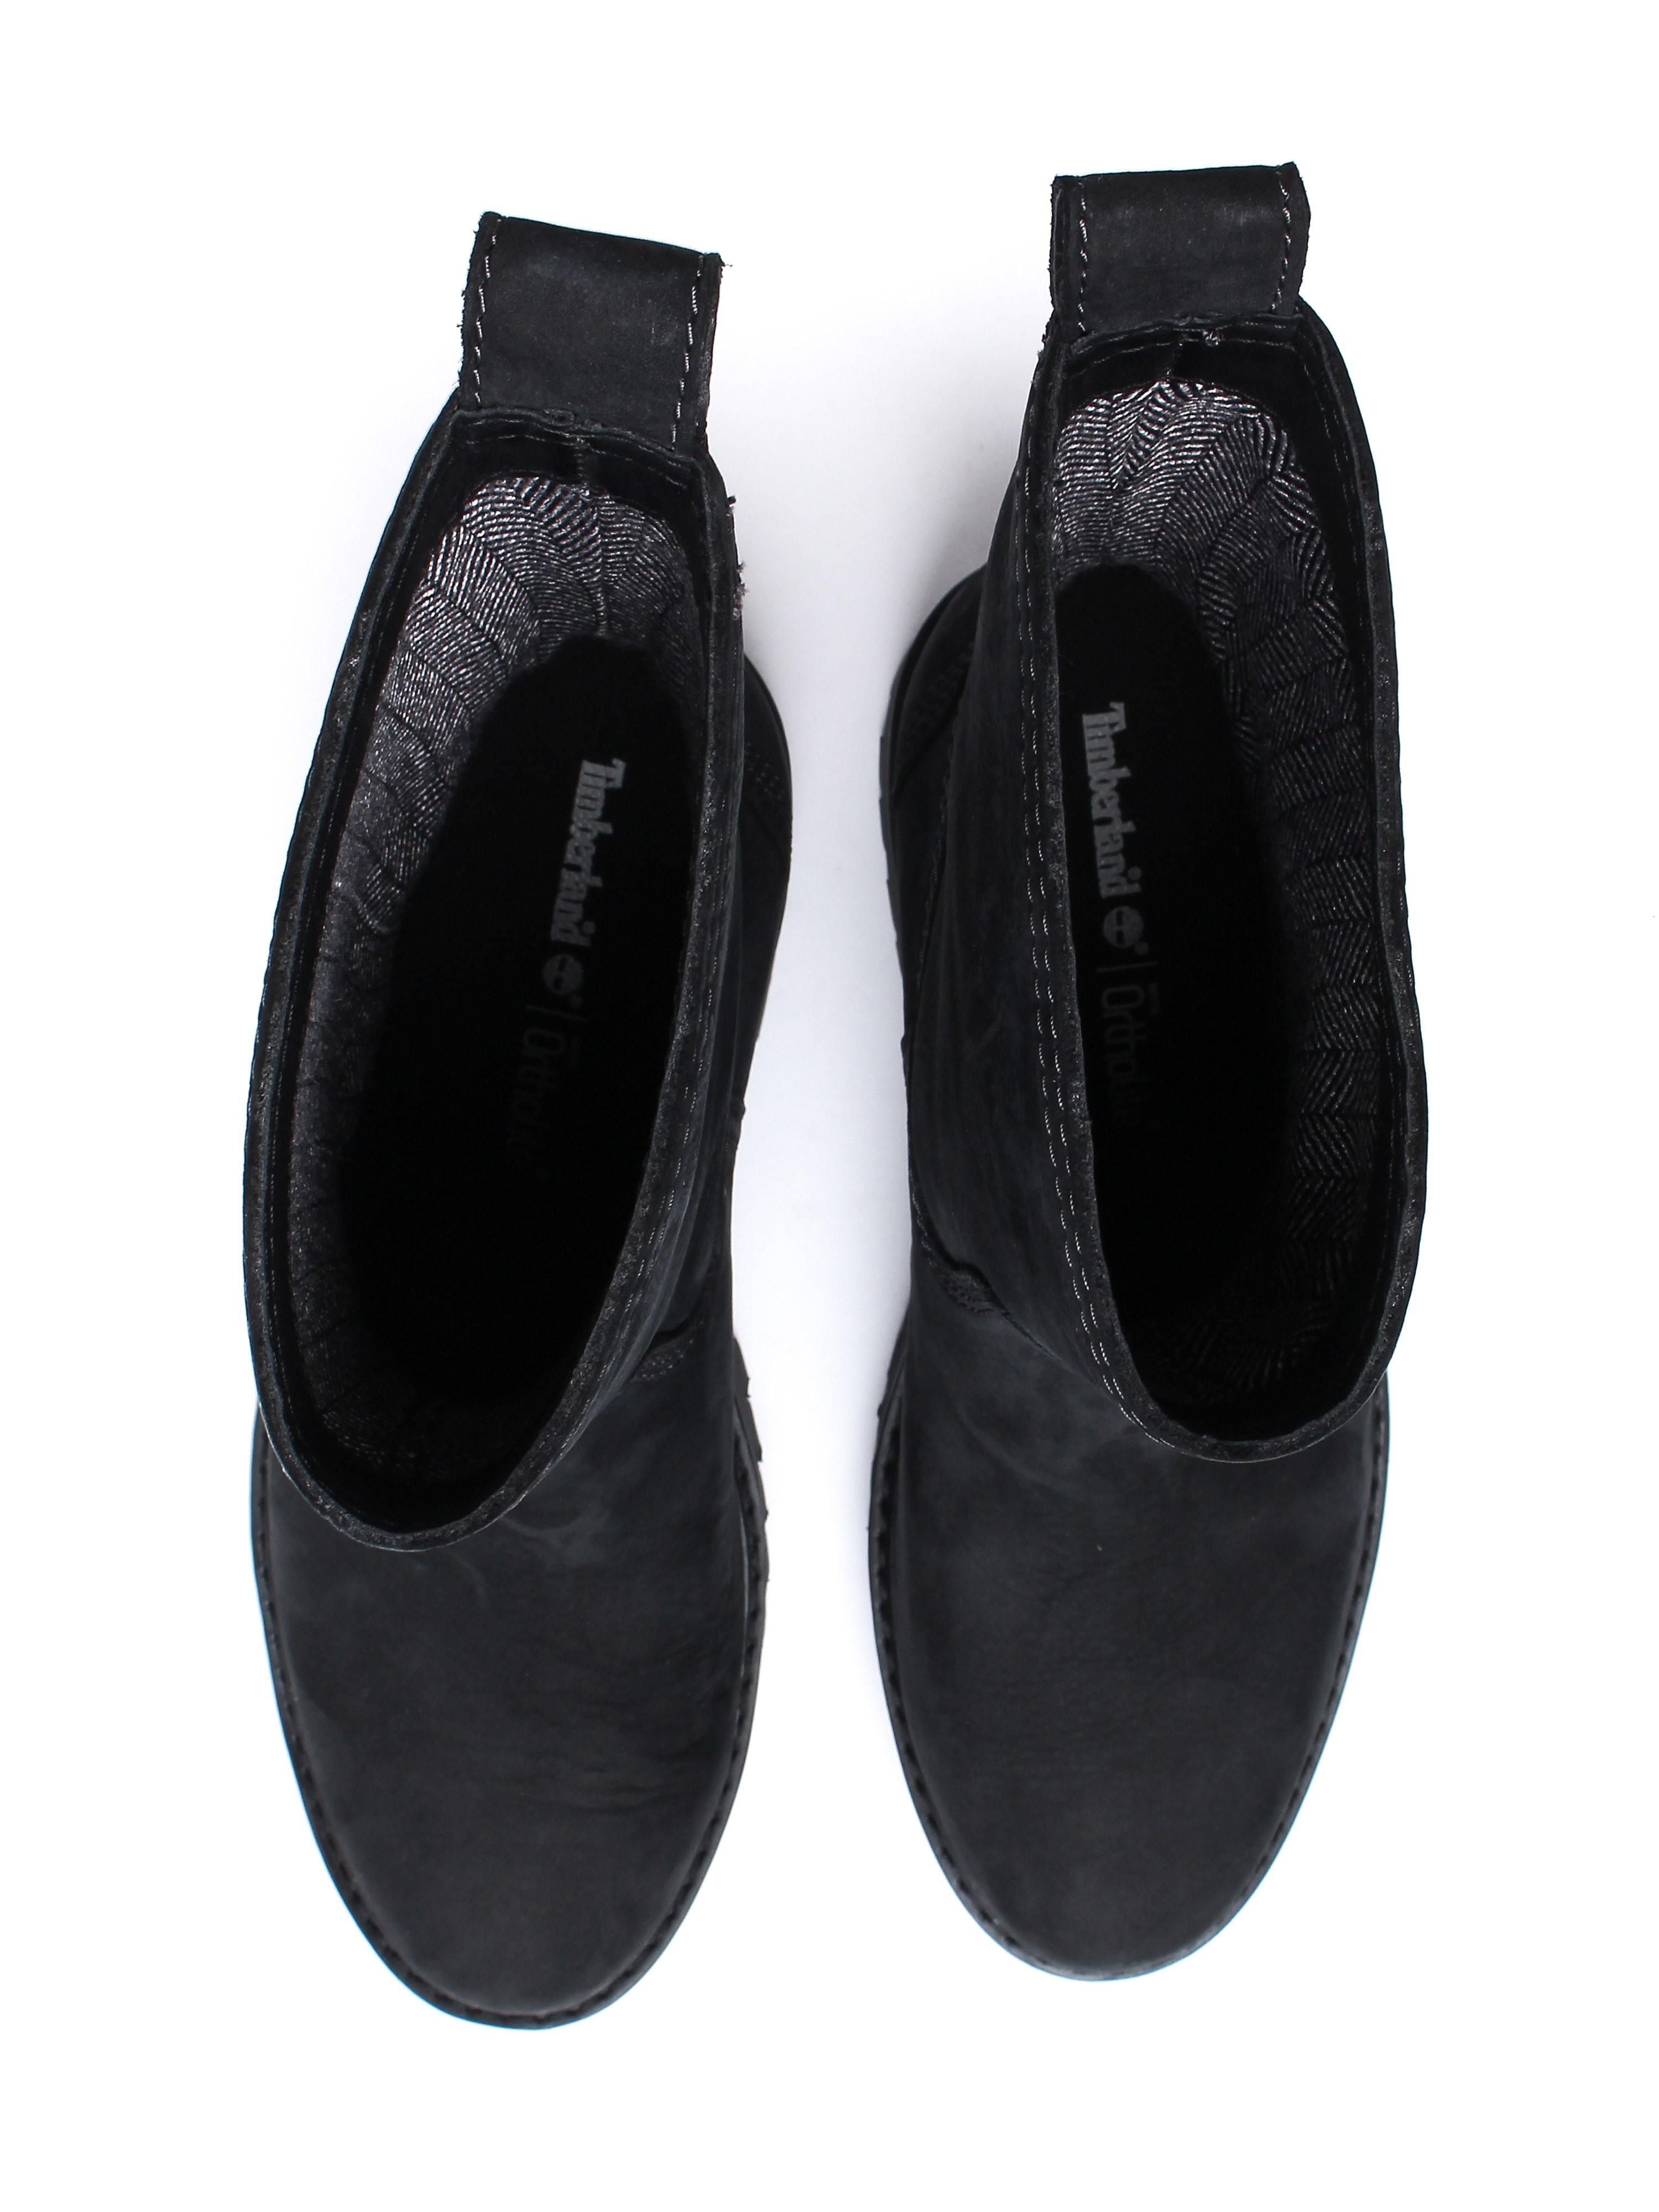 Timberland Women's Courmayeur Valley Mid Boots – Black